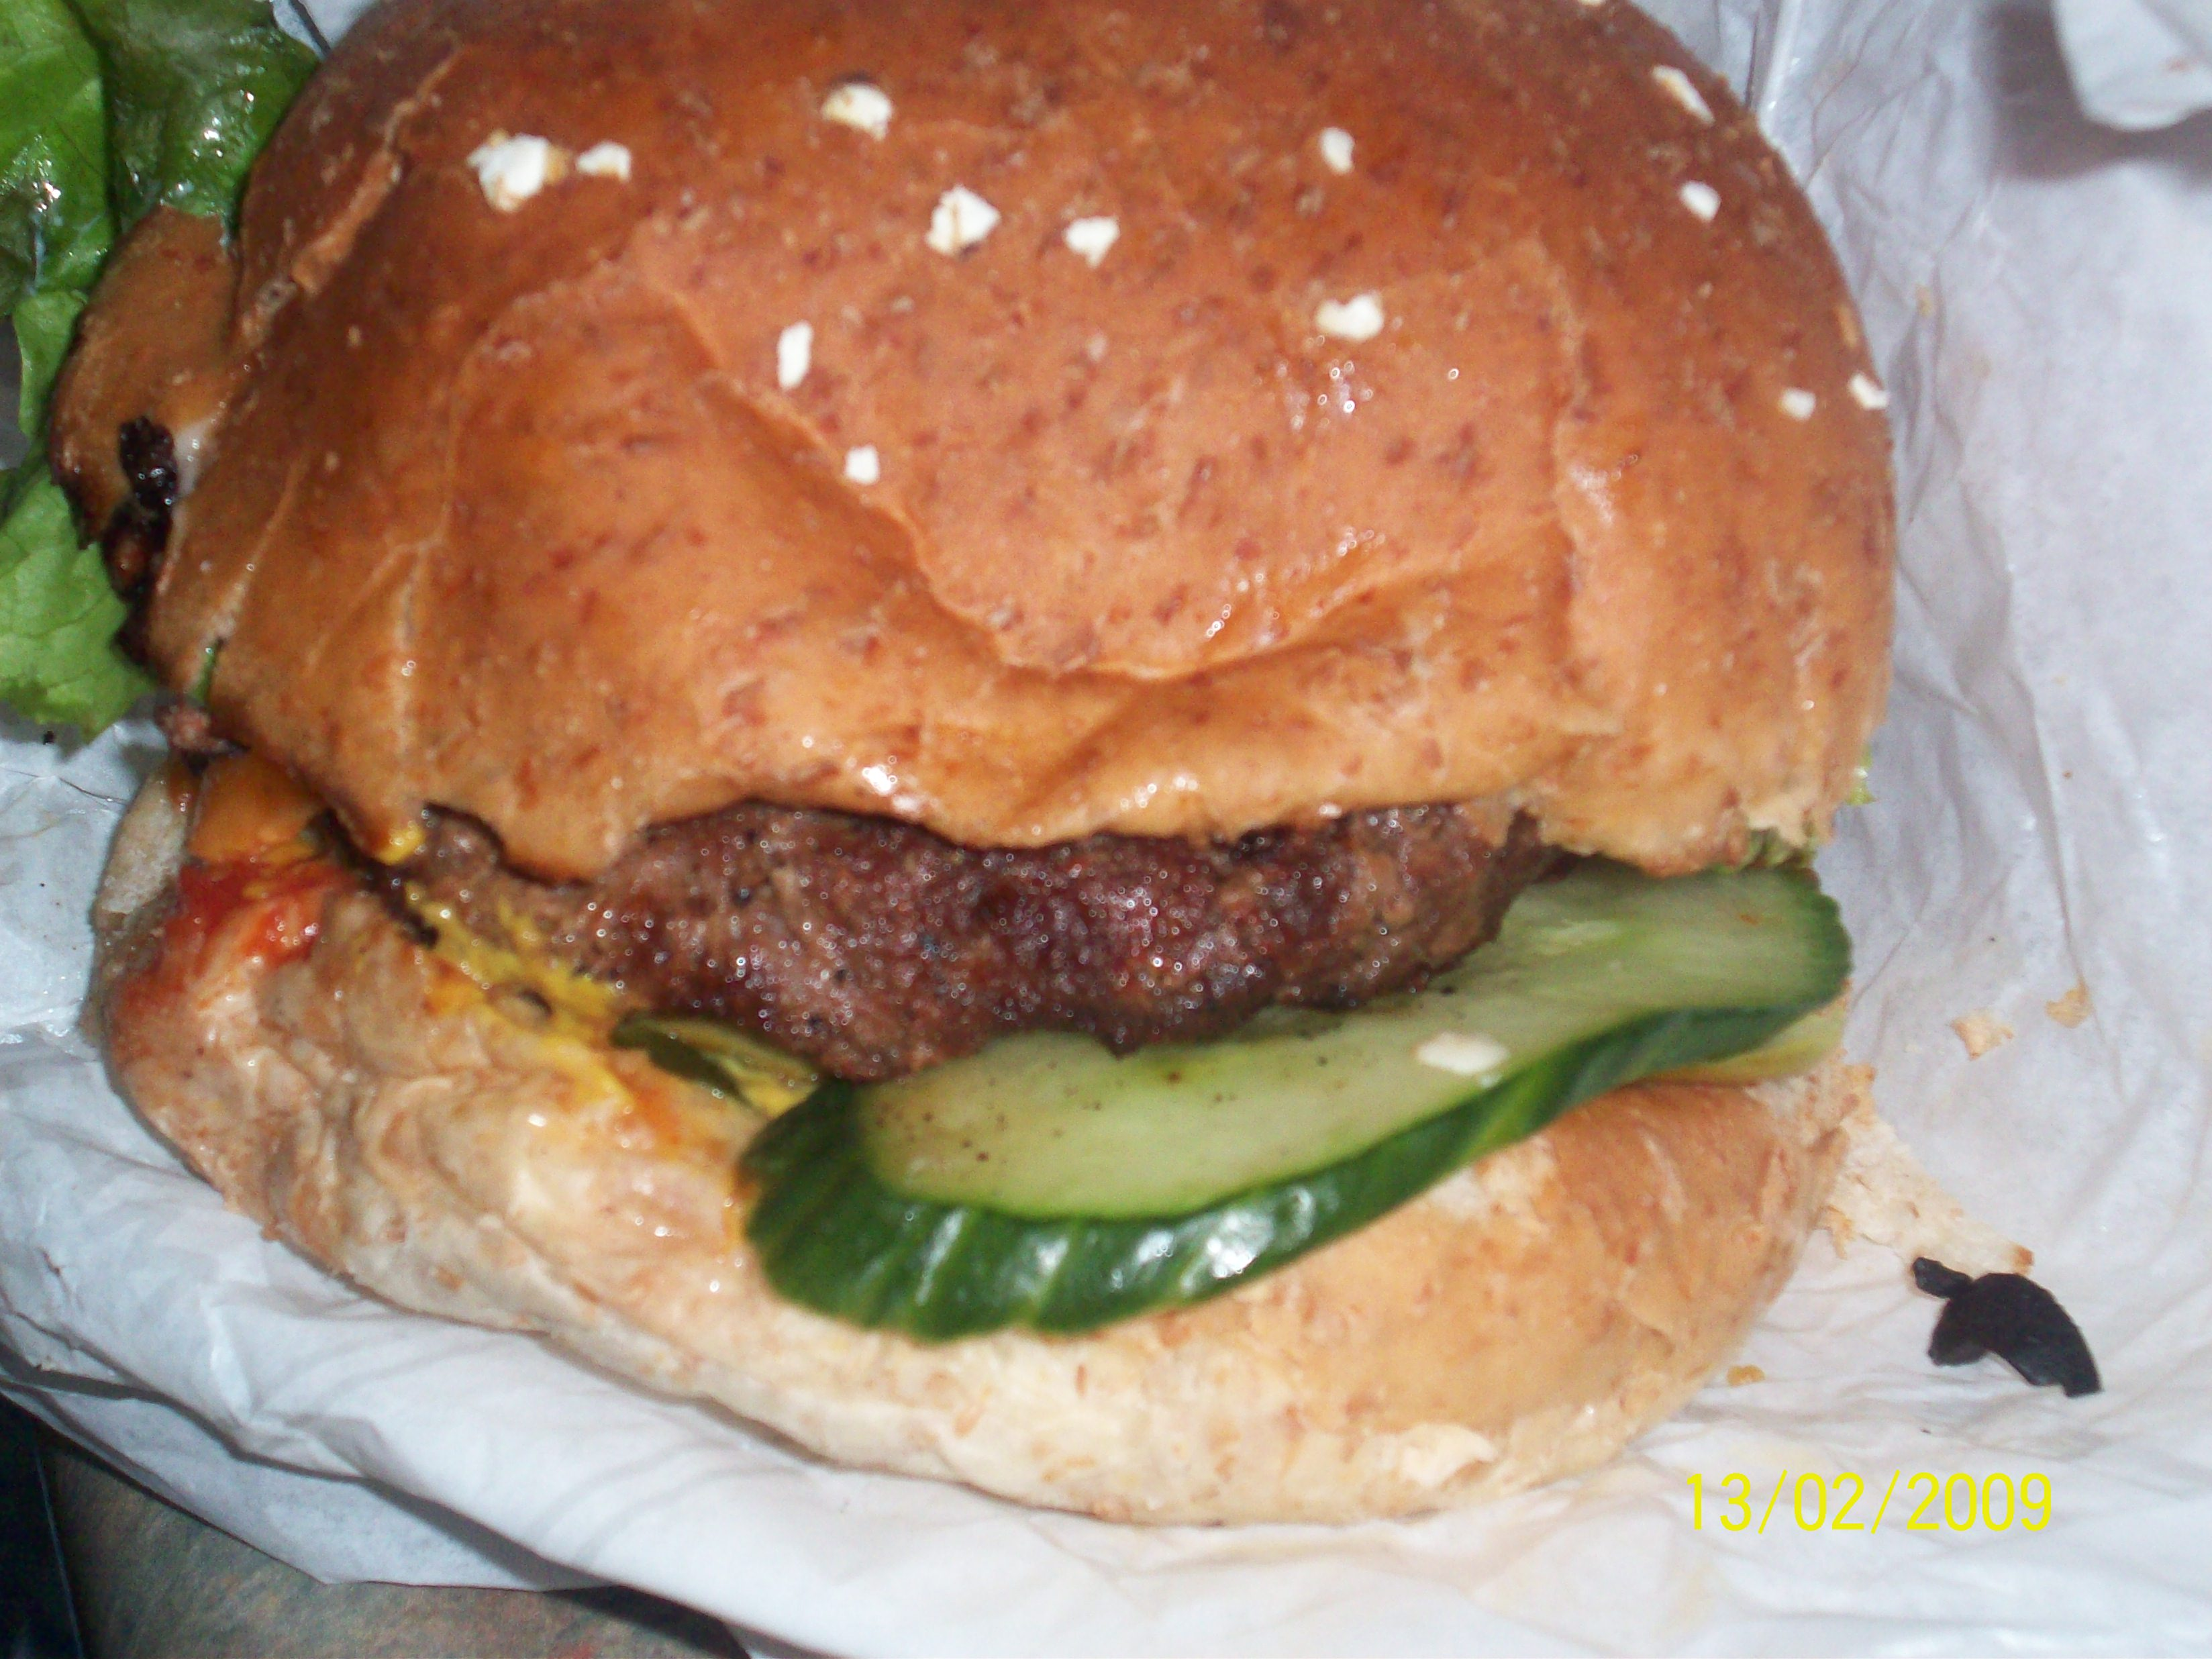 https://foodloader.net/cutie_2009-02-13_South_St._Burger_Co._Hamburger_with_Bacon.jpg